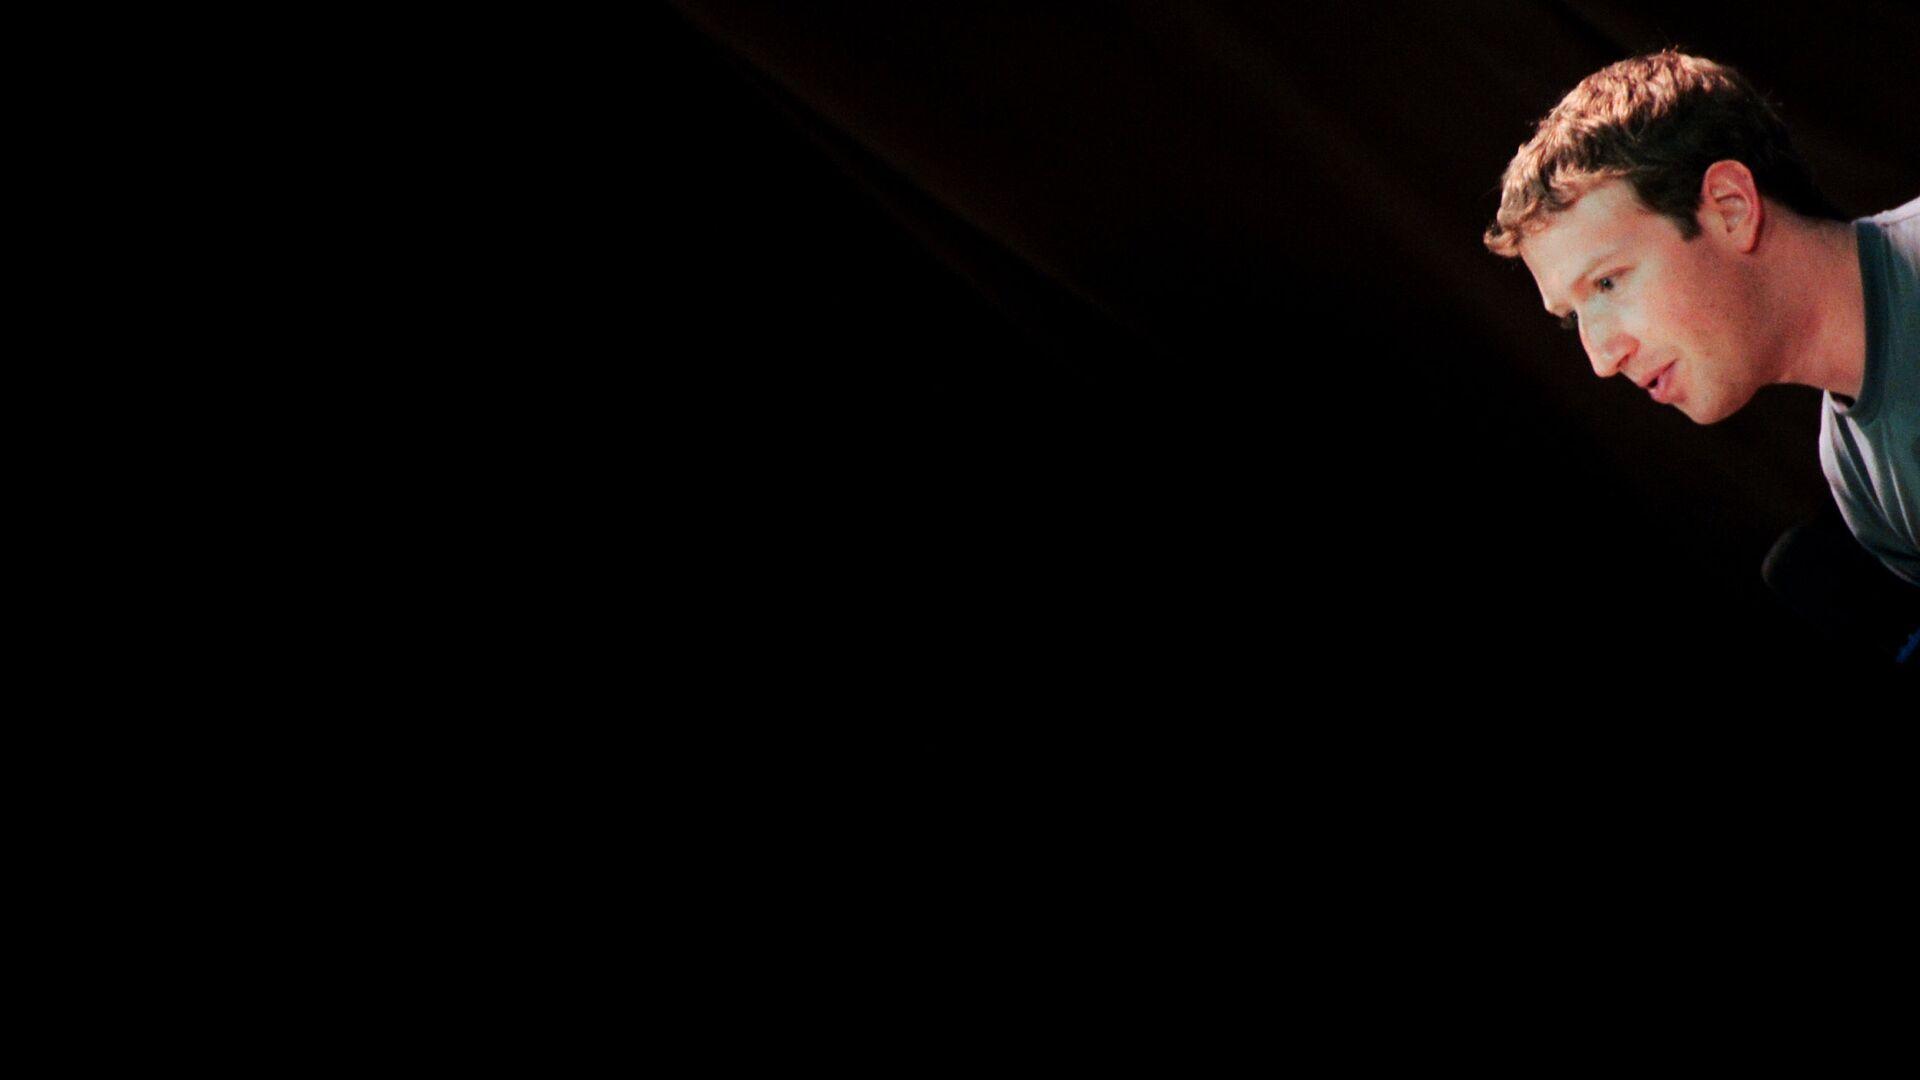 Лекция Марка Цукерберга в МГУ - Sputnik Արմենիա, 1920, 20.07.2021